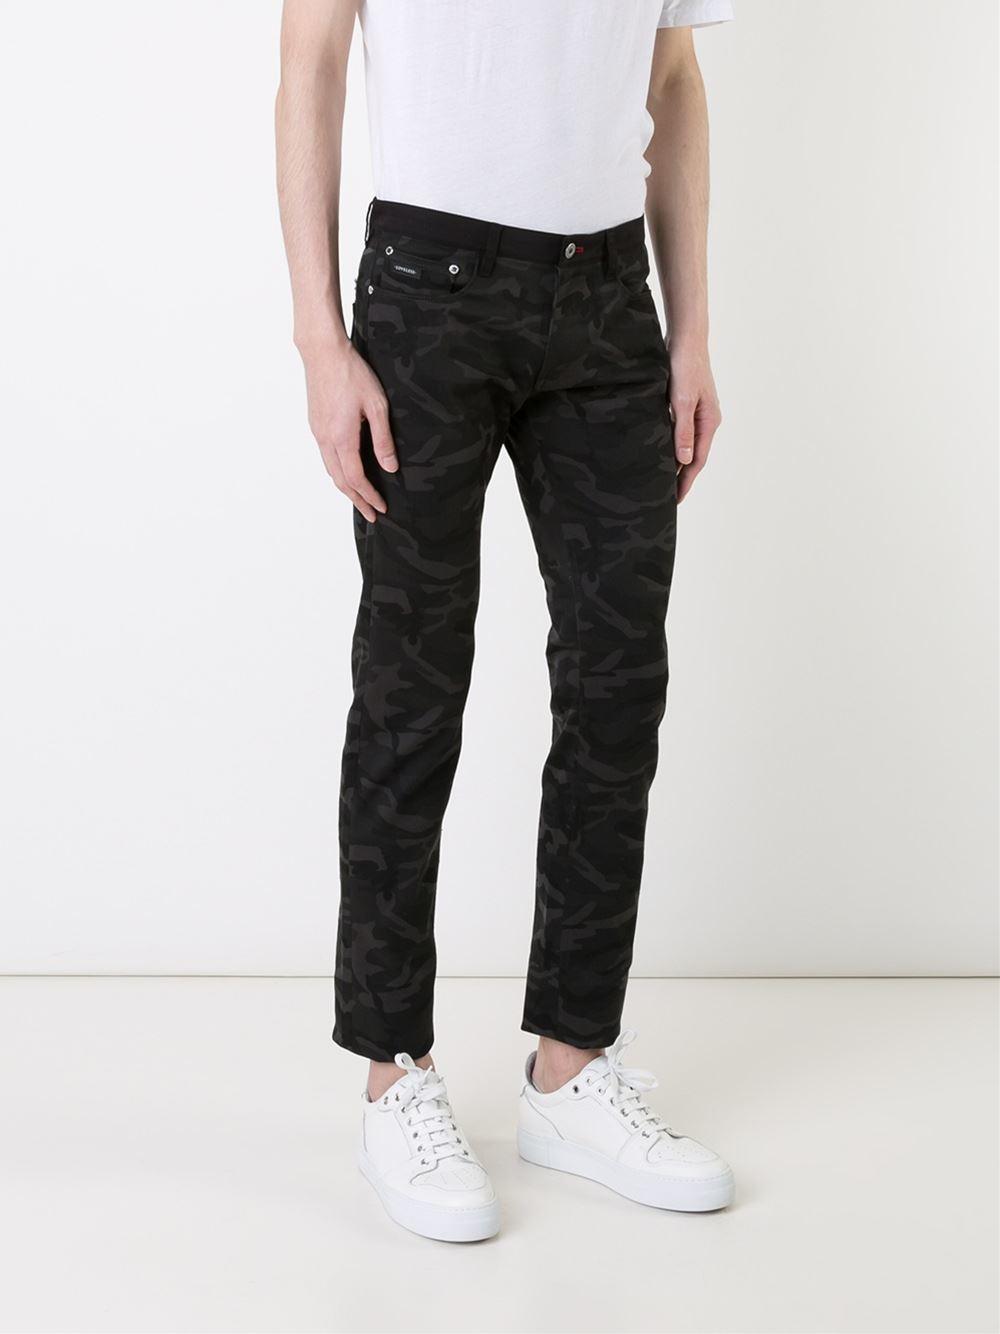 Loveless Denim Camouflage Print Skinny Jeans in Black for Men